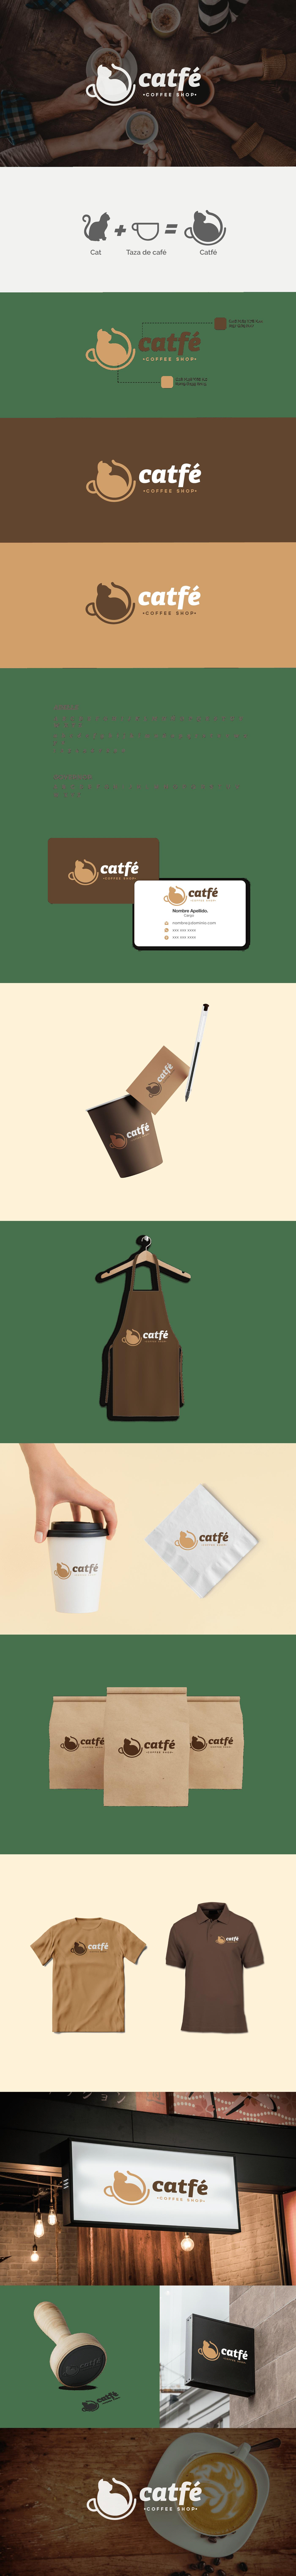 branding  Coffee coffee shop graphic design  identity logo Logo Design